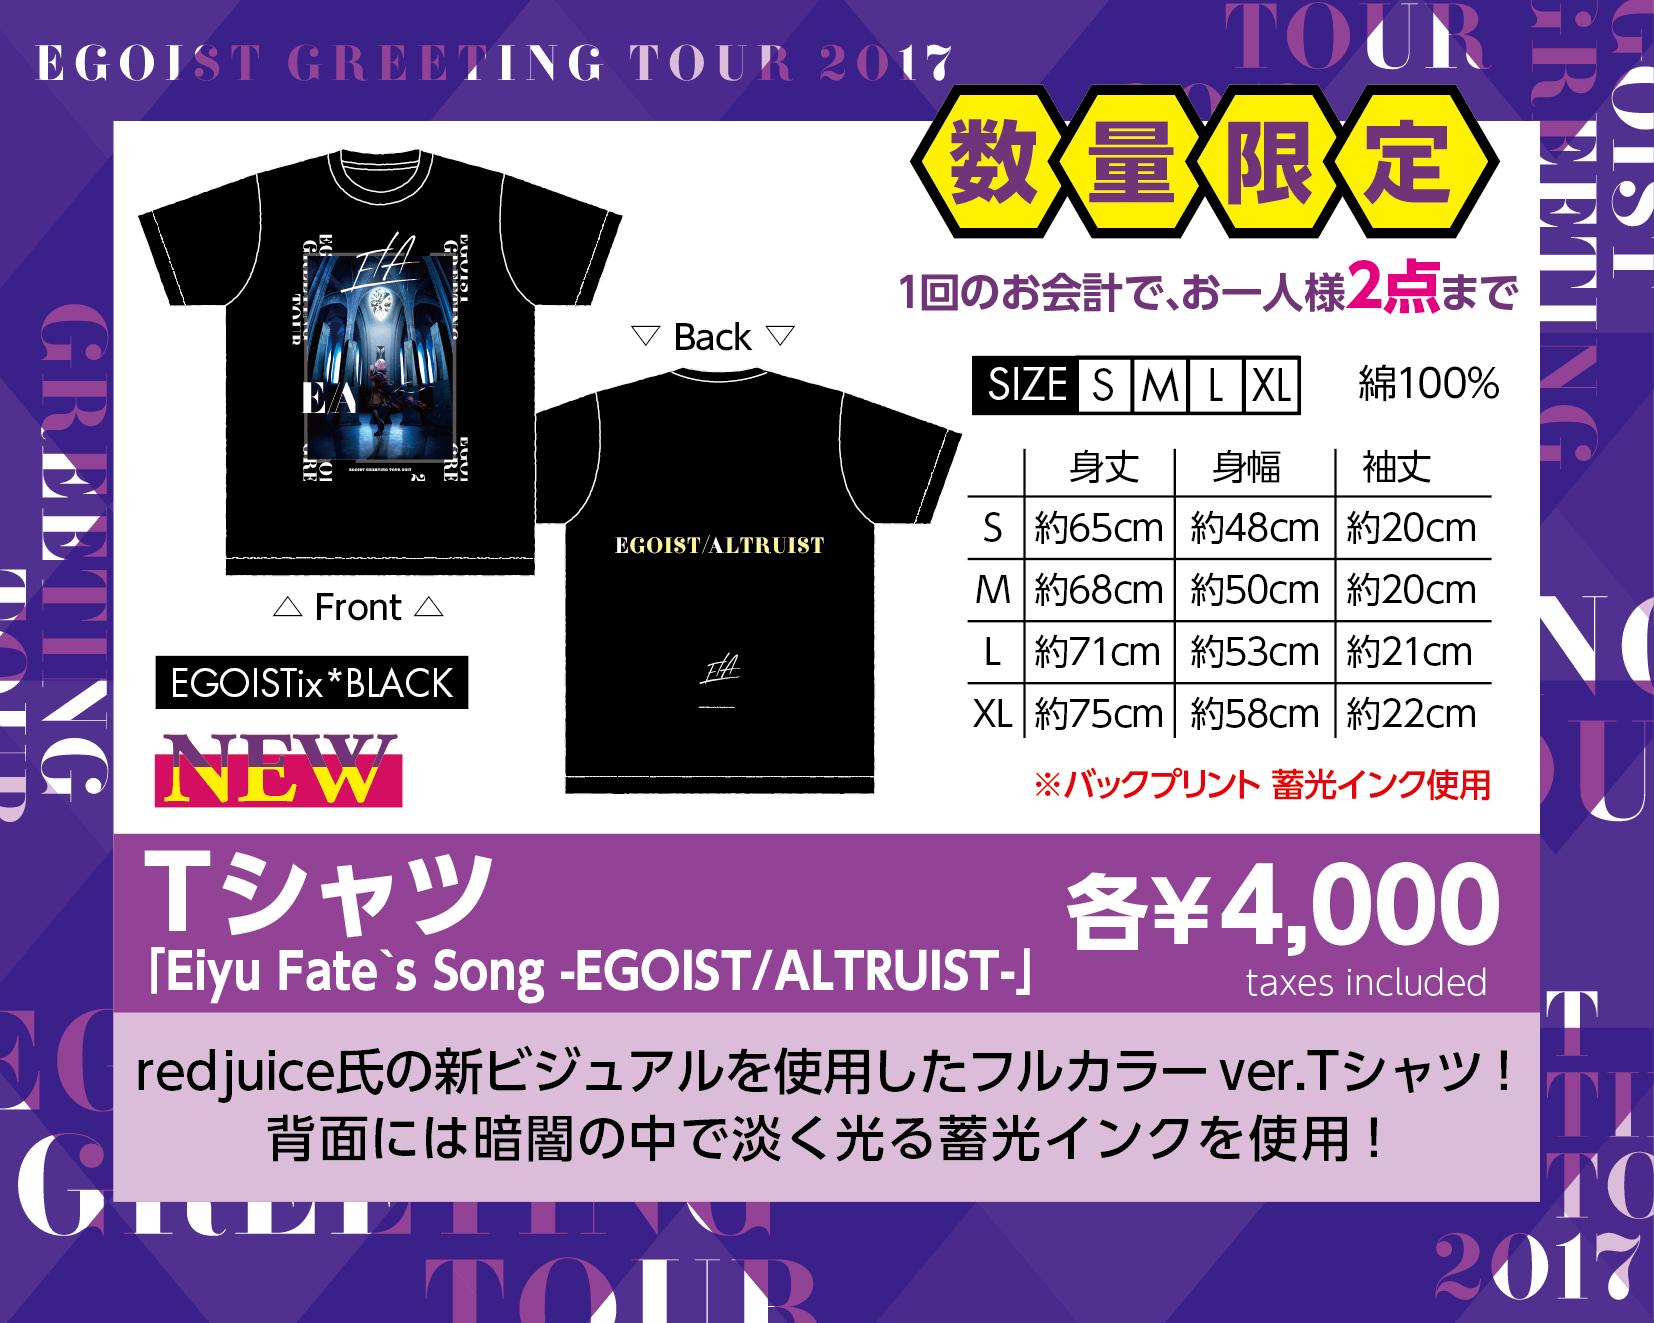 Tシャツ「Eiyu Fate`s Song-EGOIST/ALTRUIST-」